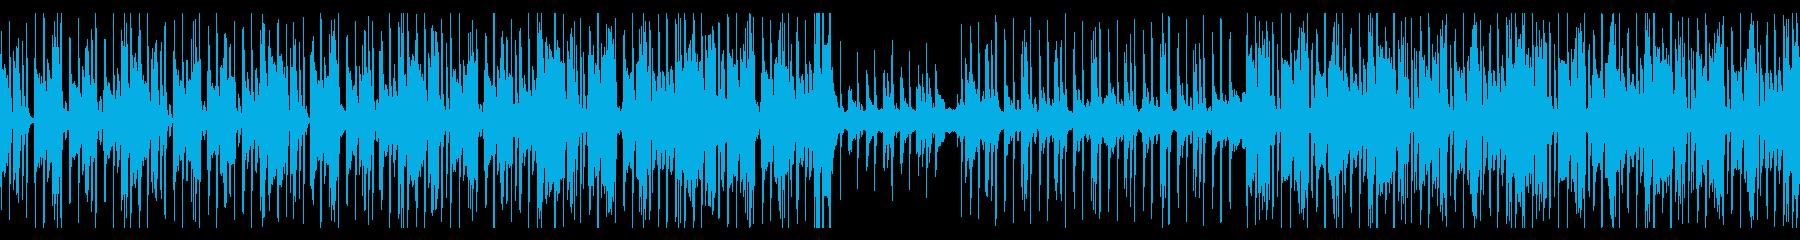 HIPHOPトラック/ゲーム/CMの再生済みの波形